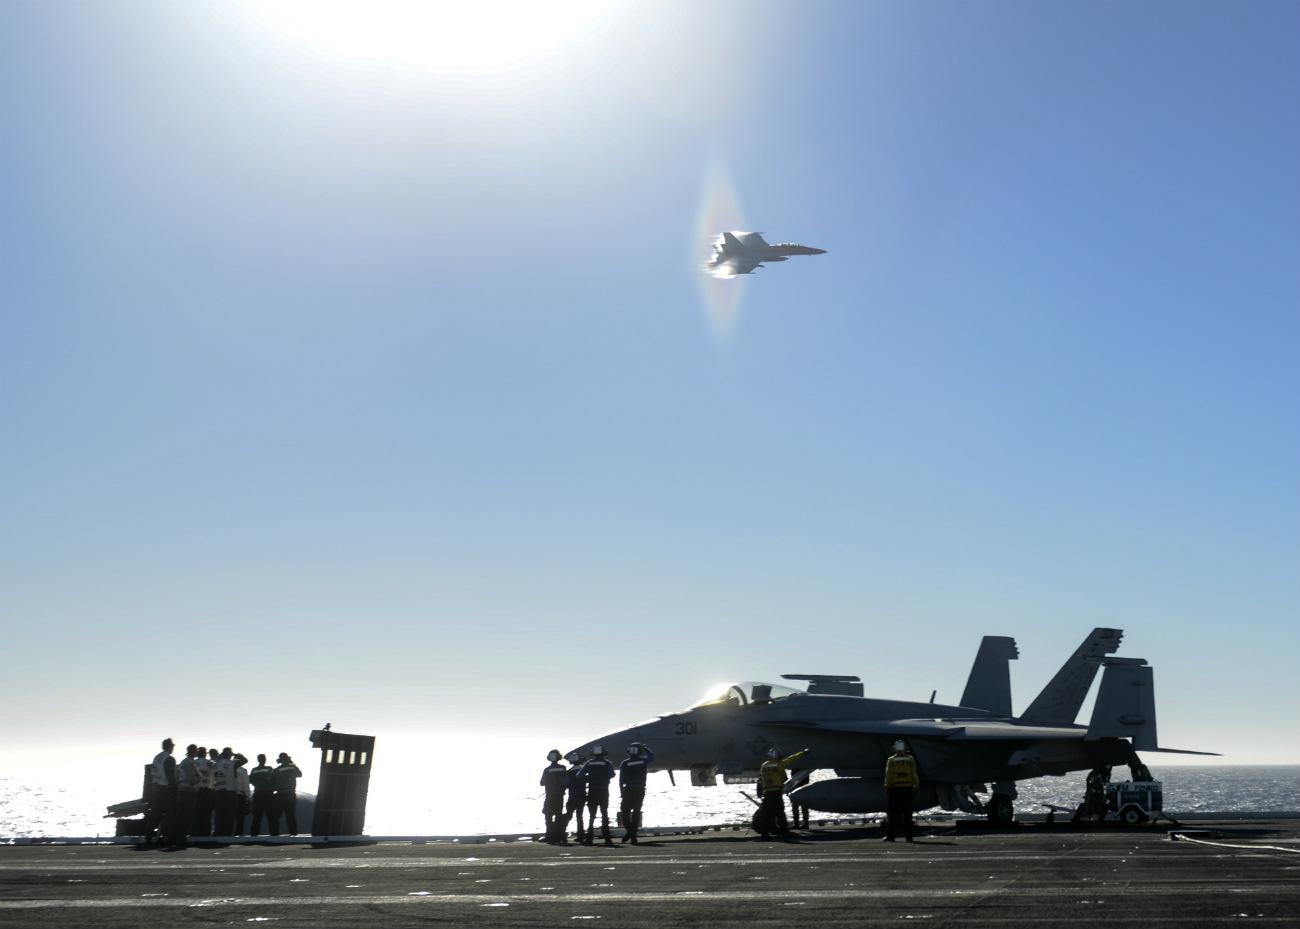 FA-18E Super Hornet preparing to break the sound barrier